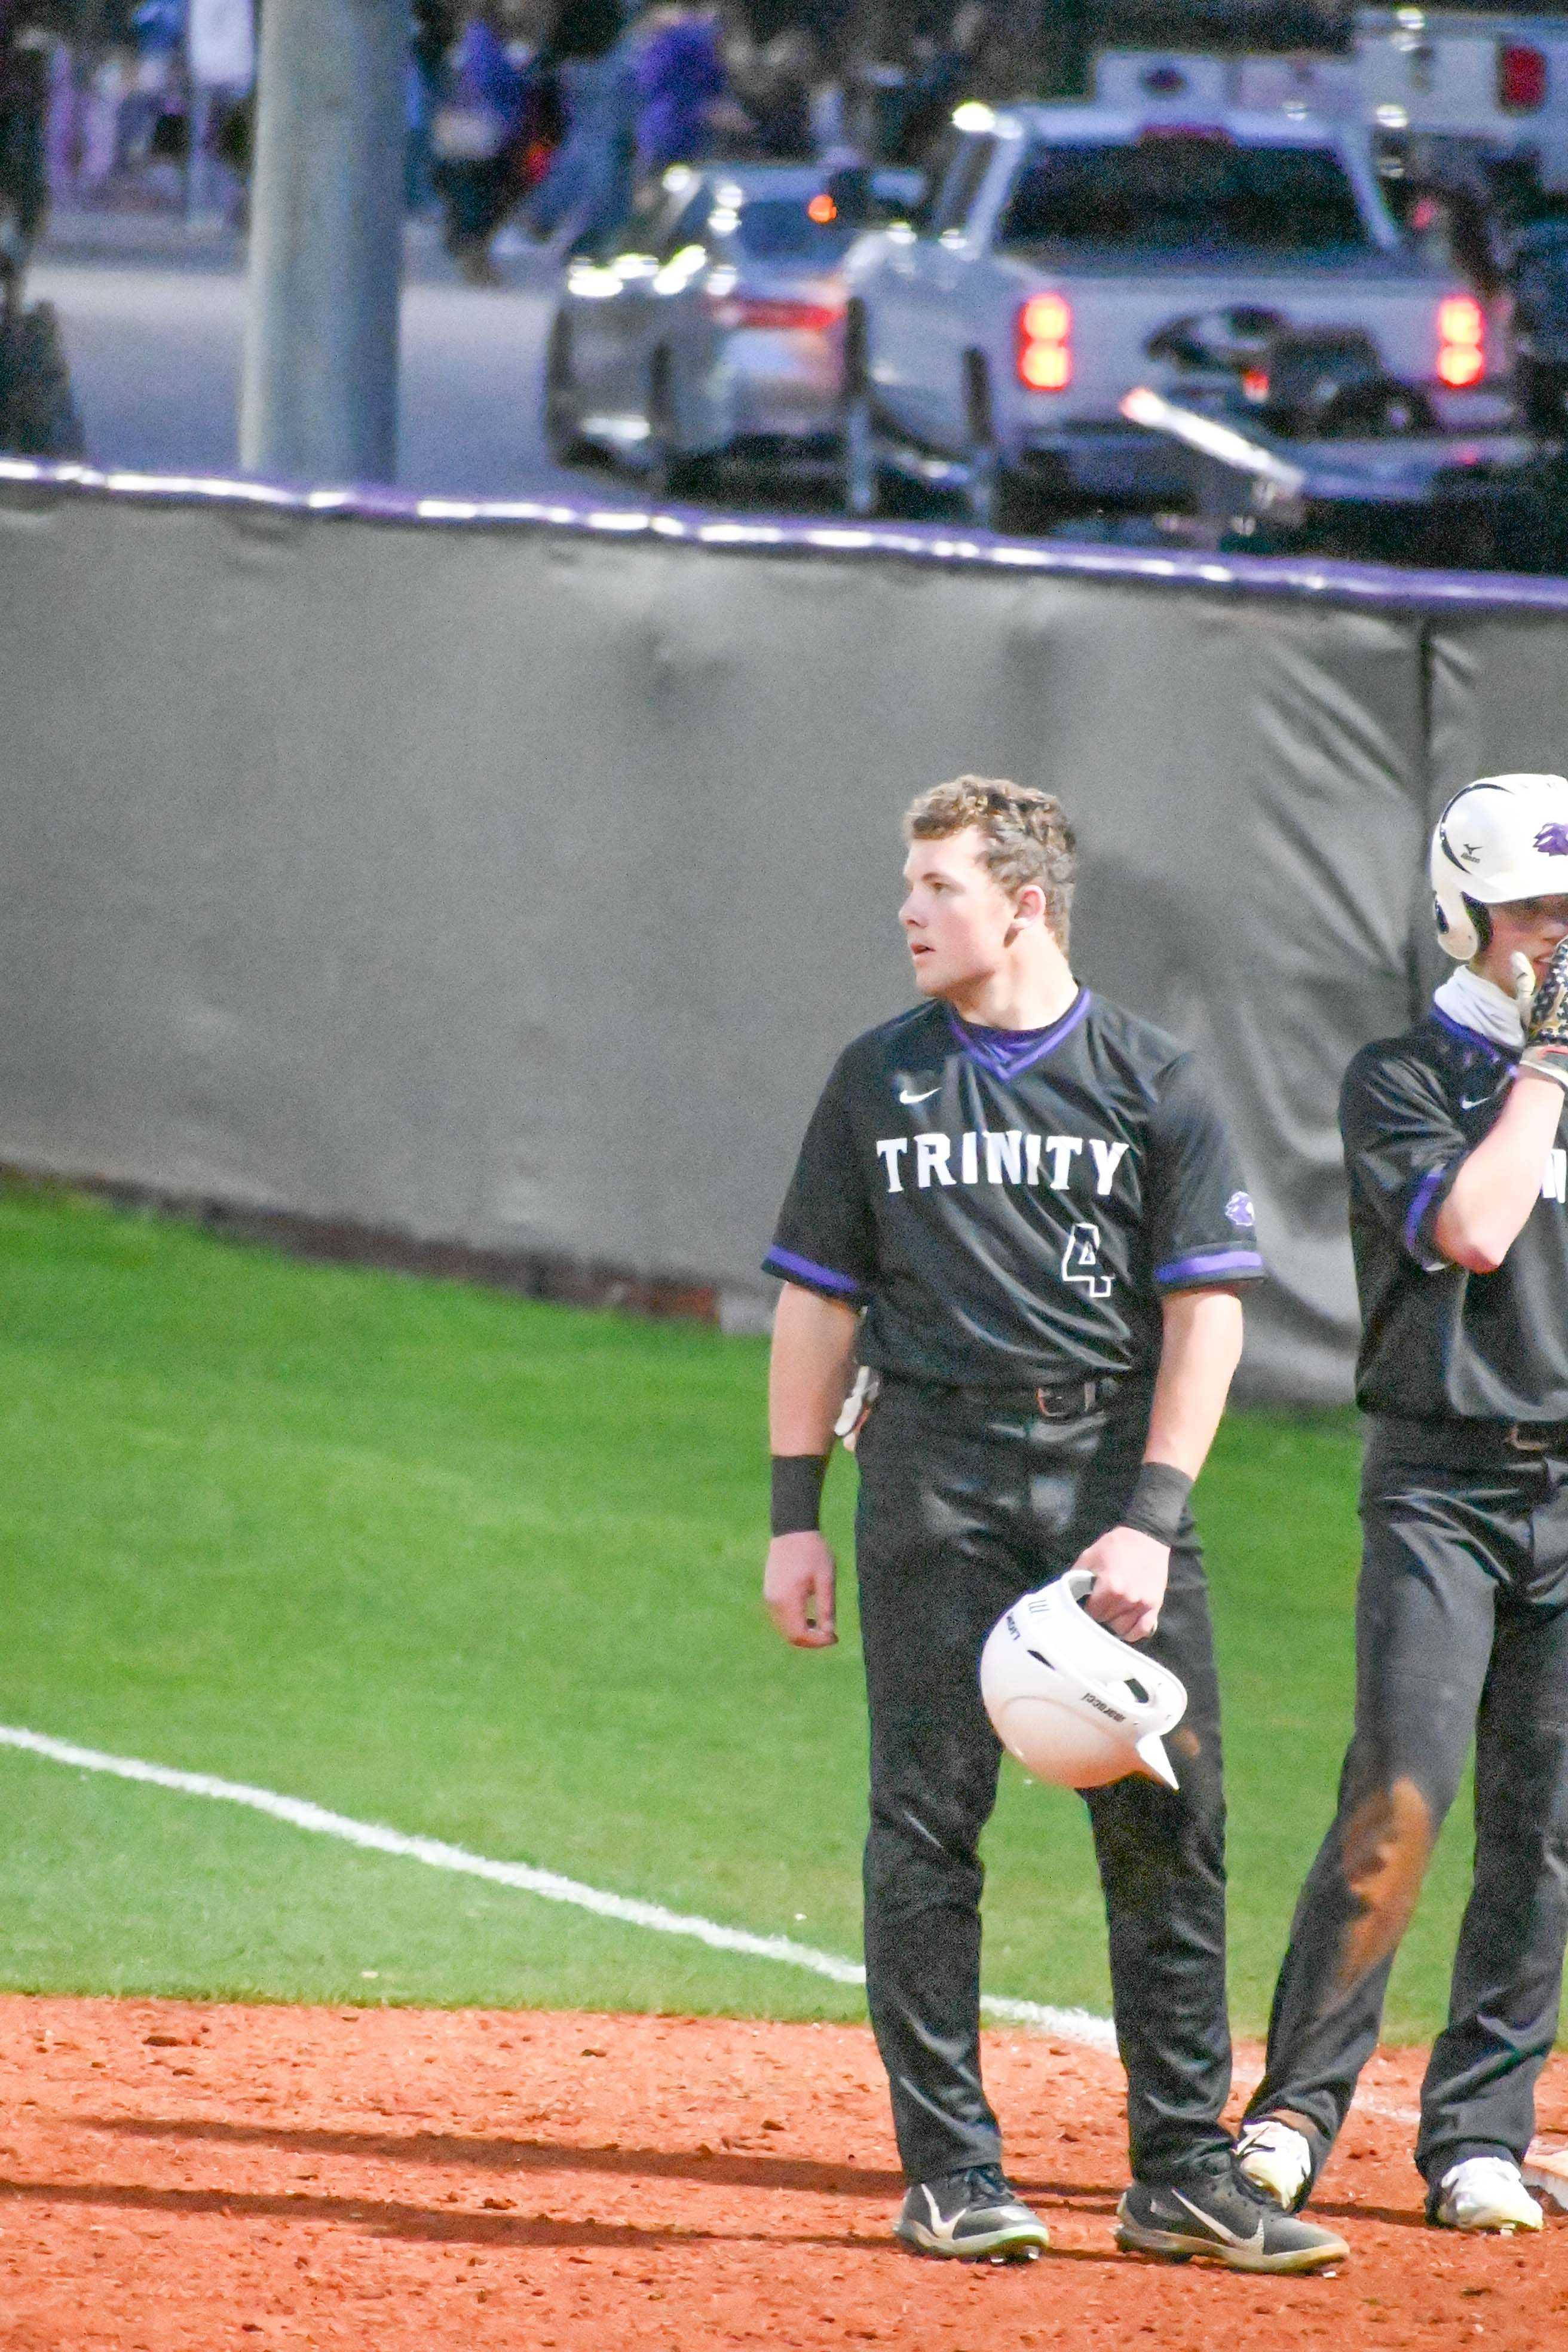 03-24-2021-Trinity-Baseball-013.jpg?mtime=20210323161113#asset:59507